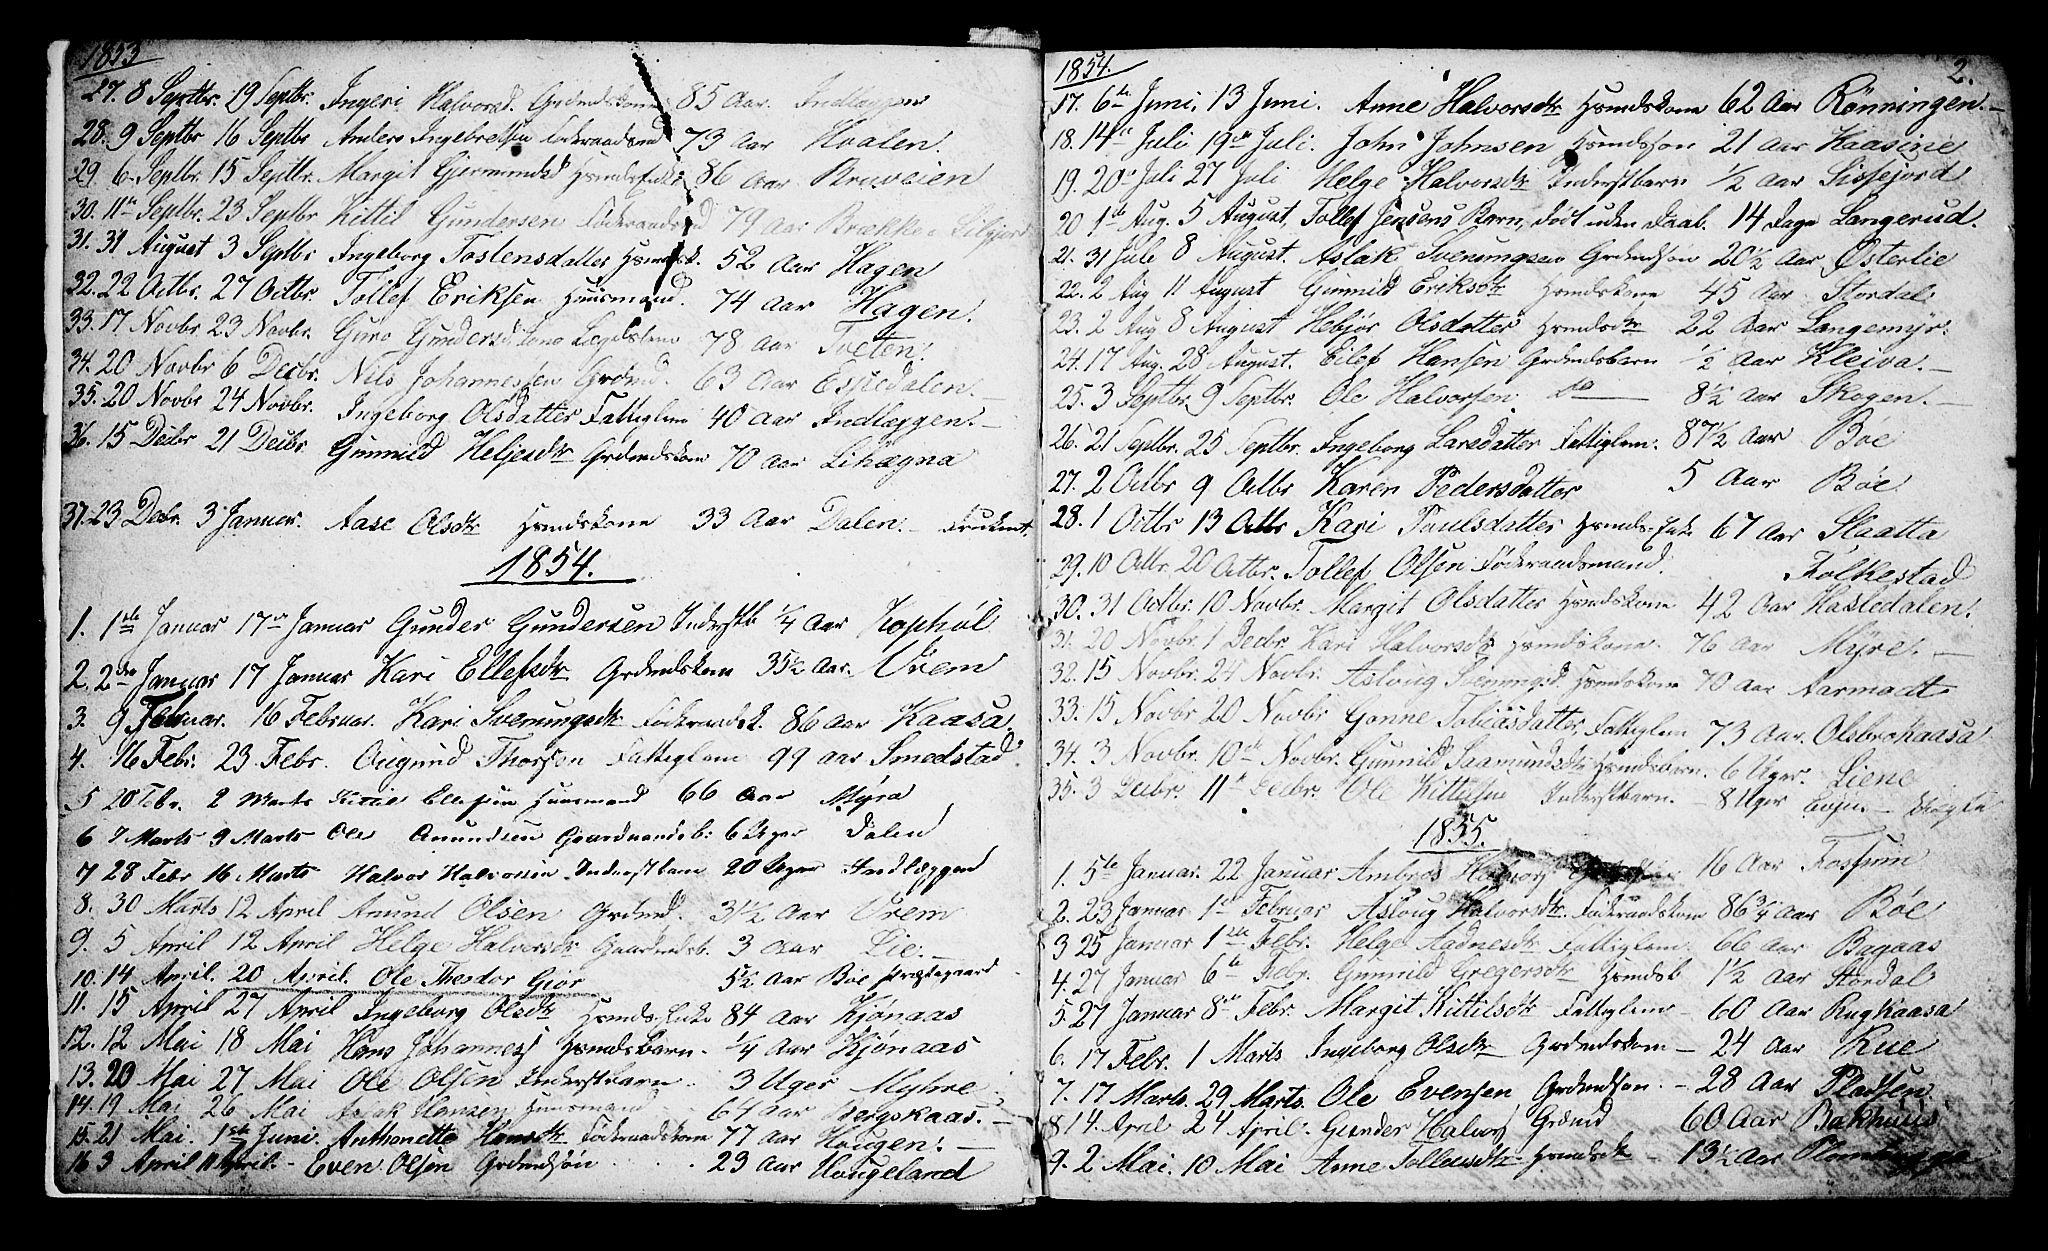 SAKO, Bø kirkebøker, G/Ga/L0002: Klokkerbok nr. 2, 1853-1866, s. 2